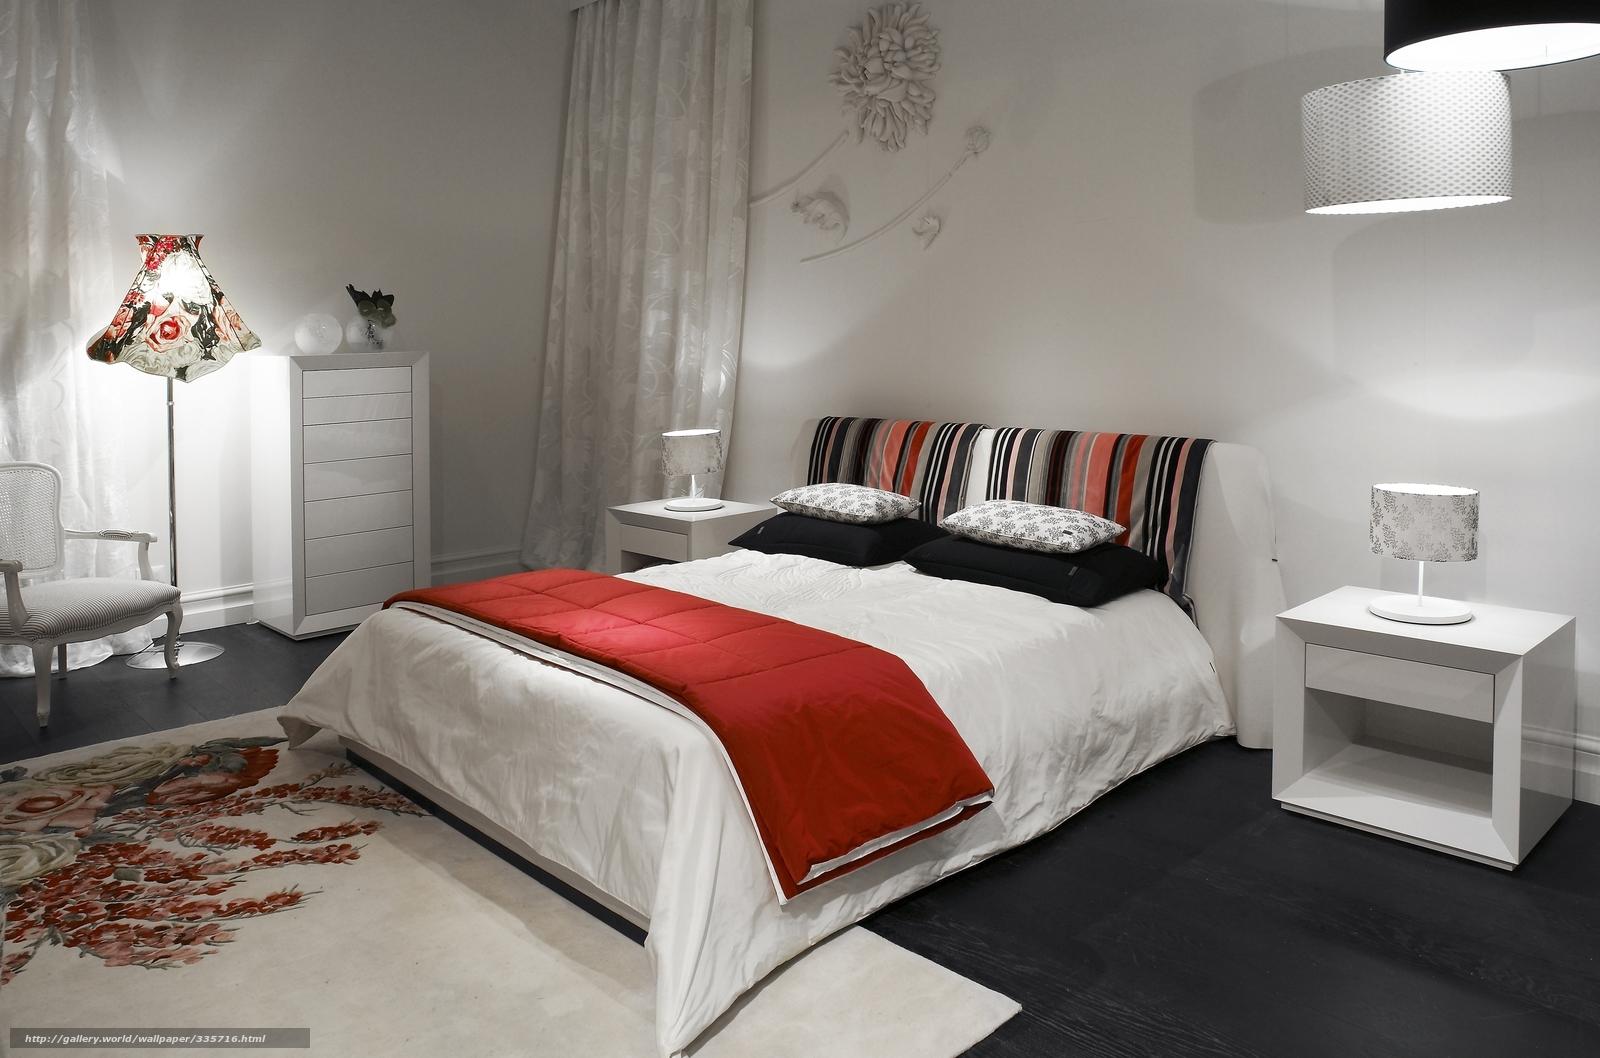 Tlcharger fond d'ecran lit, chambre coucher, blanc fonds d'ecran ...